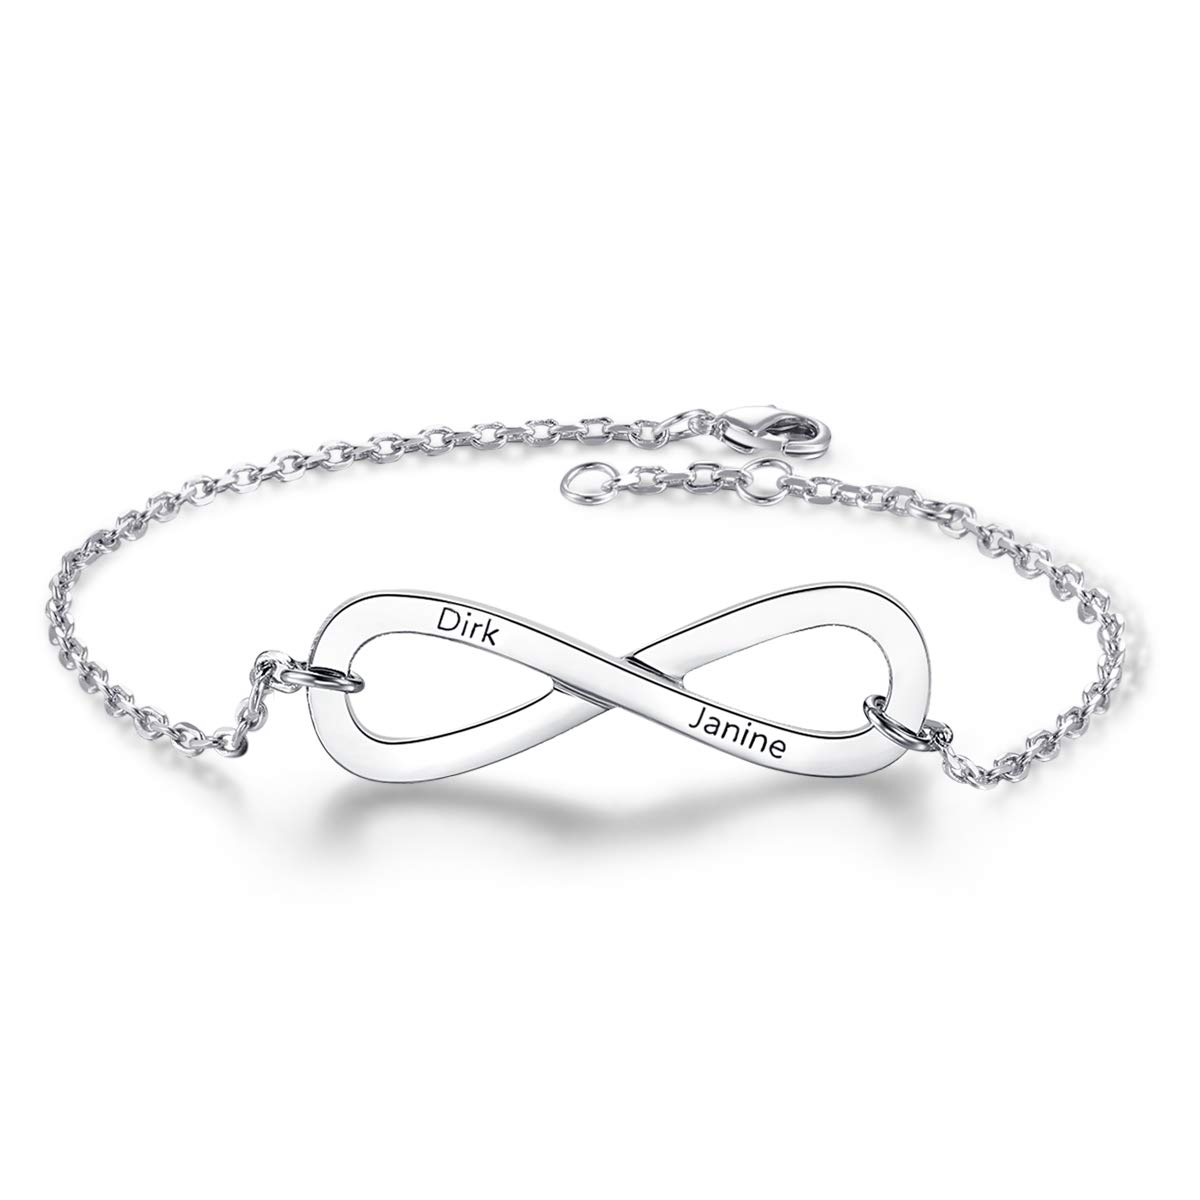 Dreamdecor Personalized 2 Names Infinity Bracelet Adjusted Chain Custom Engraved Link Bracelet Jewelry Gift